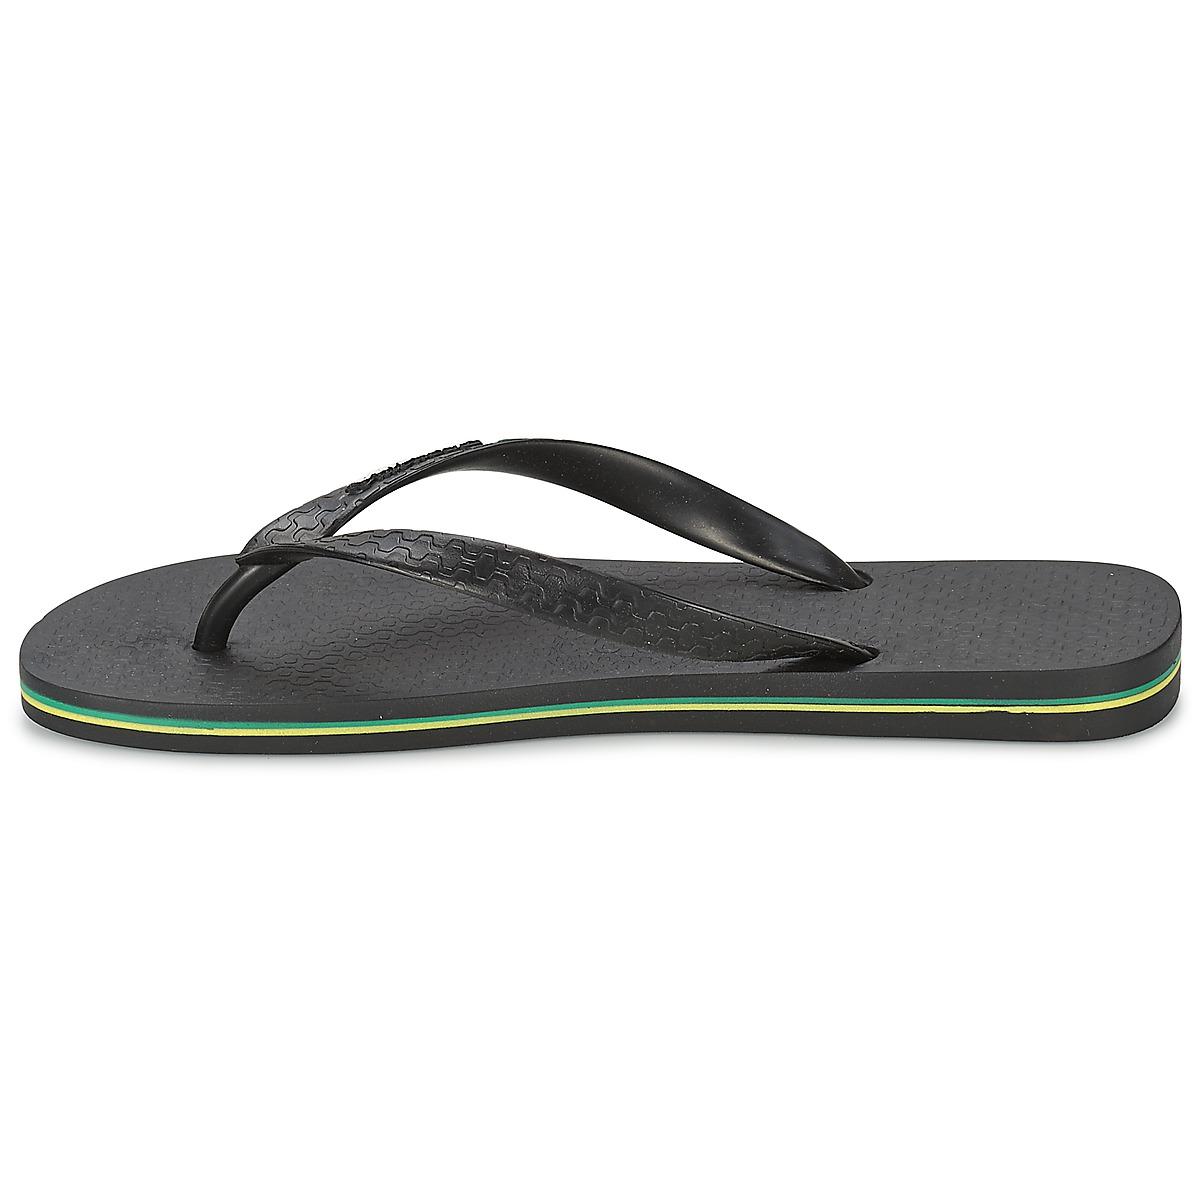 81330f97be0bde Flip-Flops Black Flip Flops - Ipanema Classica Brasil Ii Ad Black